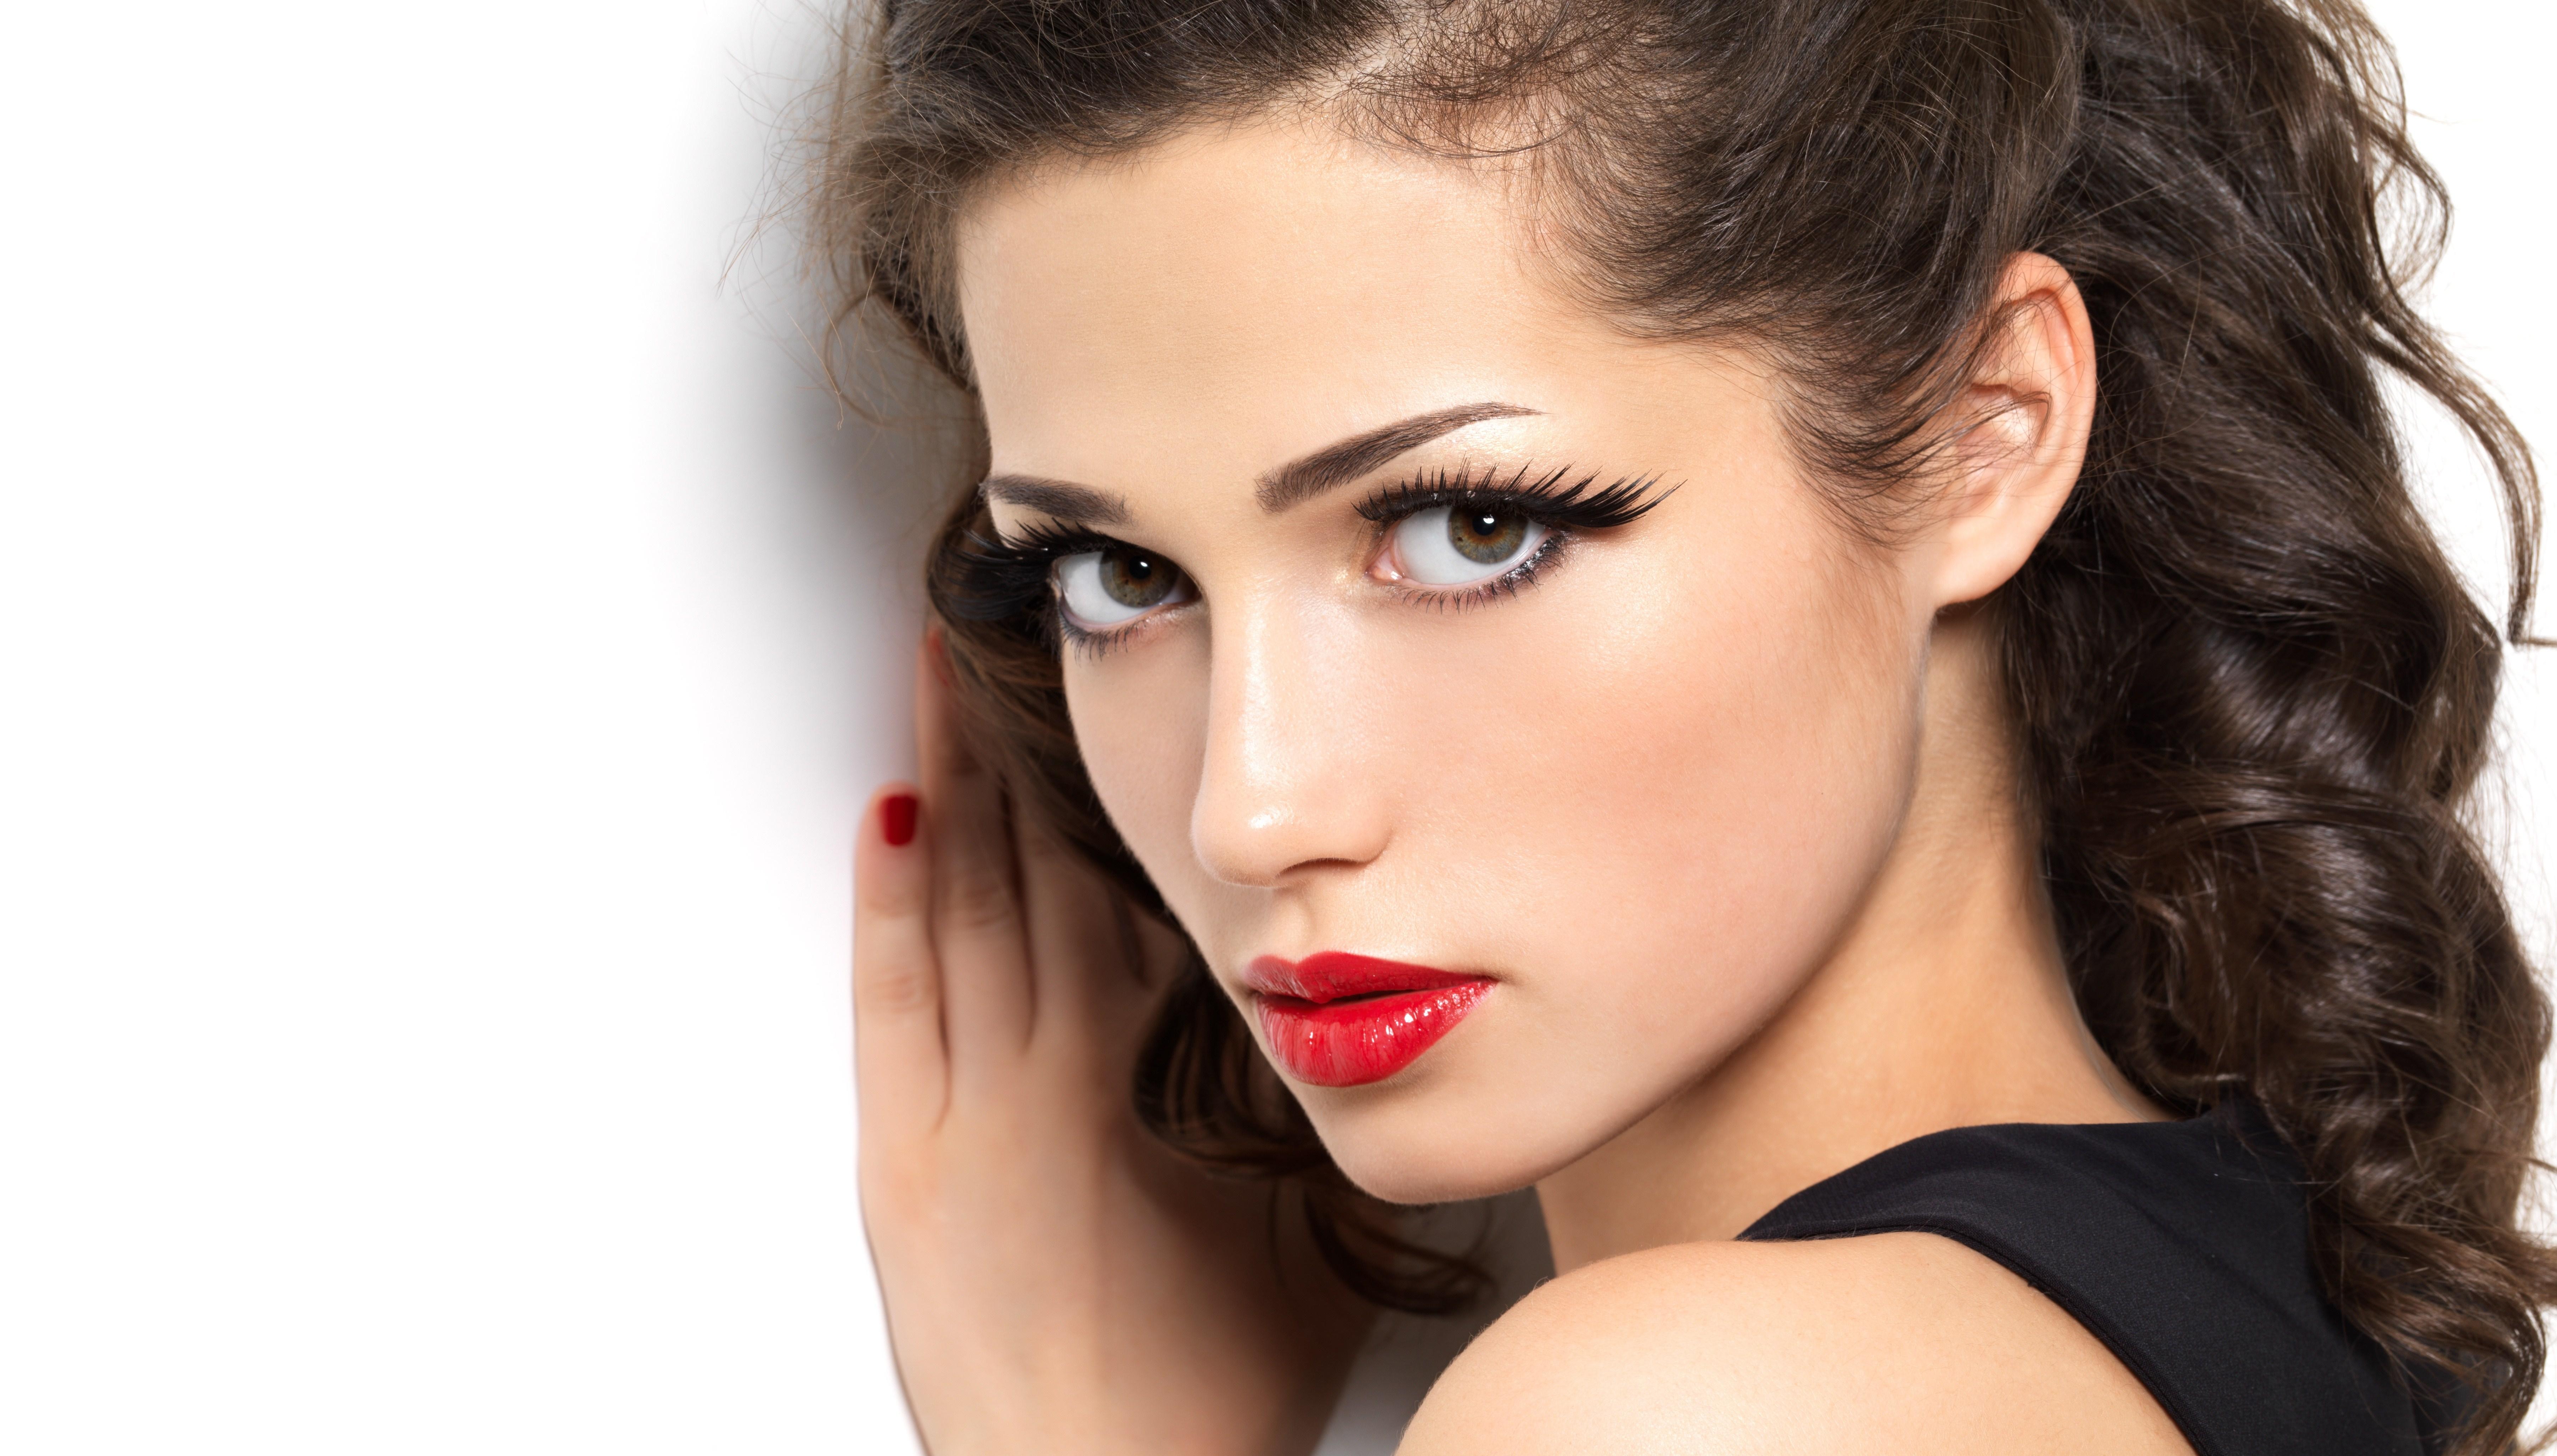 Wallpaper Face Women Model Black Background Looking: Gesicht 5k Retina Ultra HD Wallpaper And Hintergrund